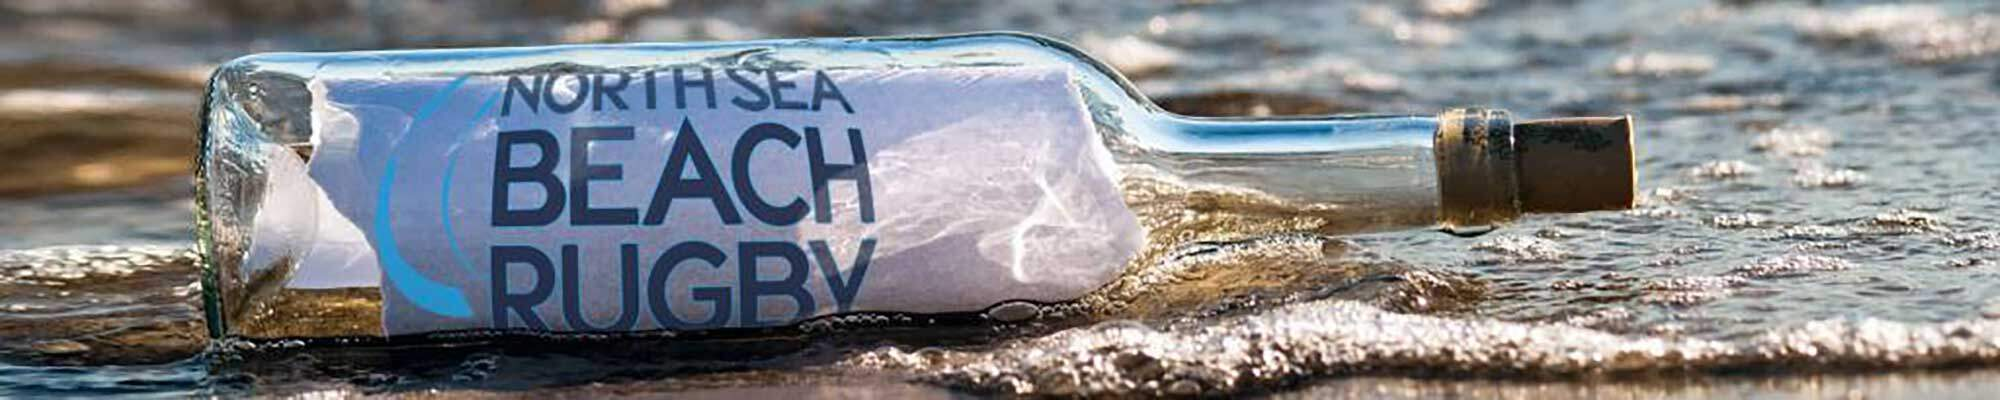 KONTAKT NORTH SEA BEACH RUGBY